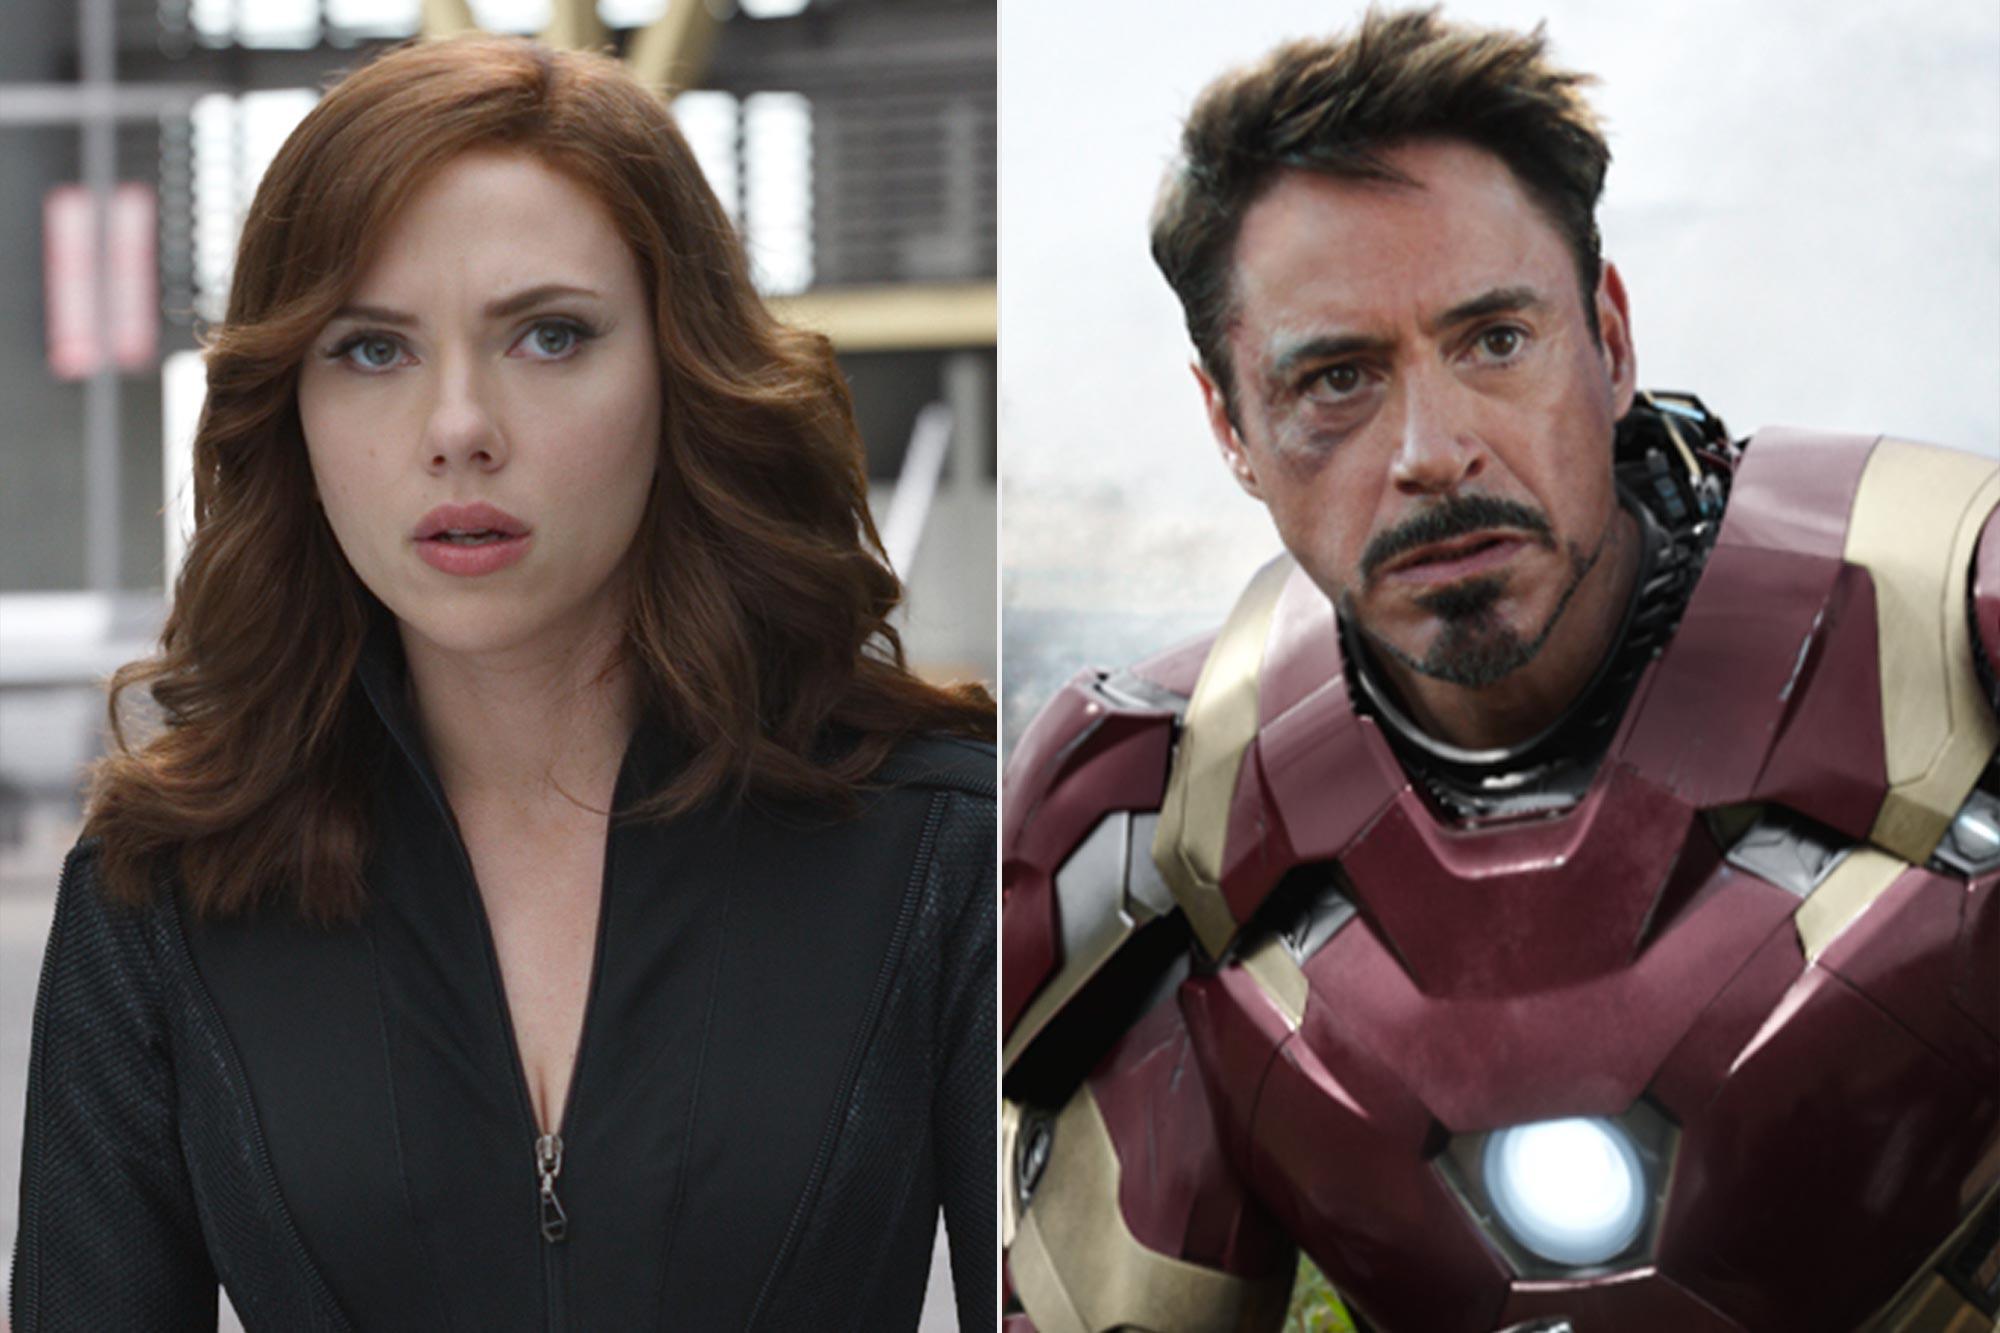 Captain America: Civil War Black Widow and Iron Man